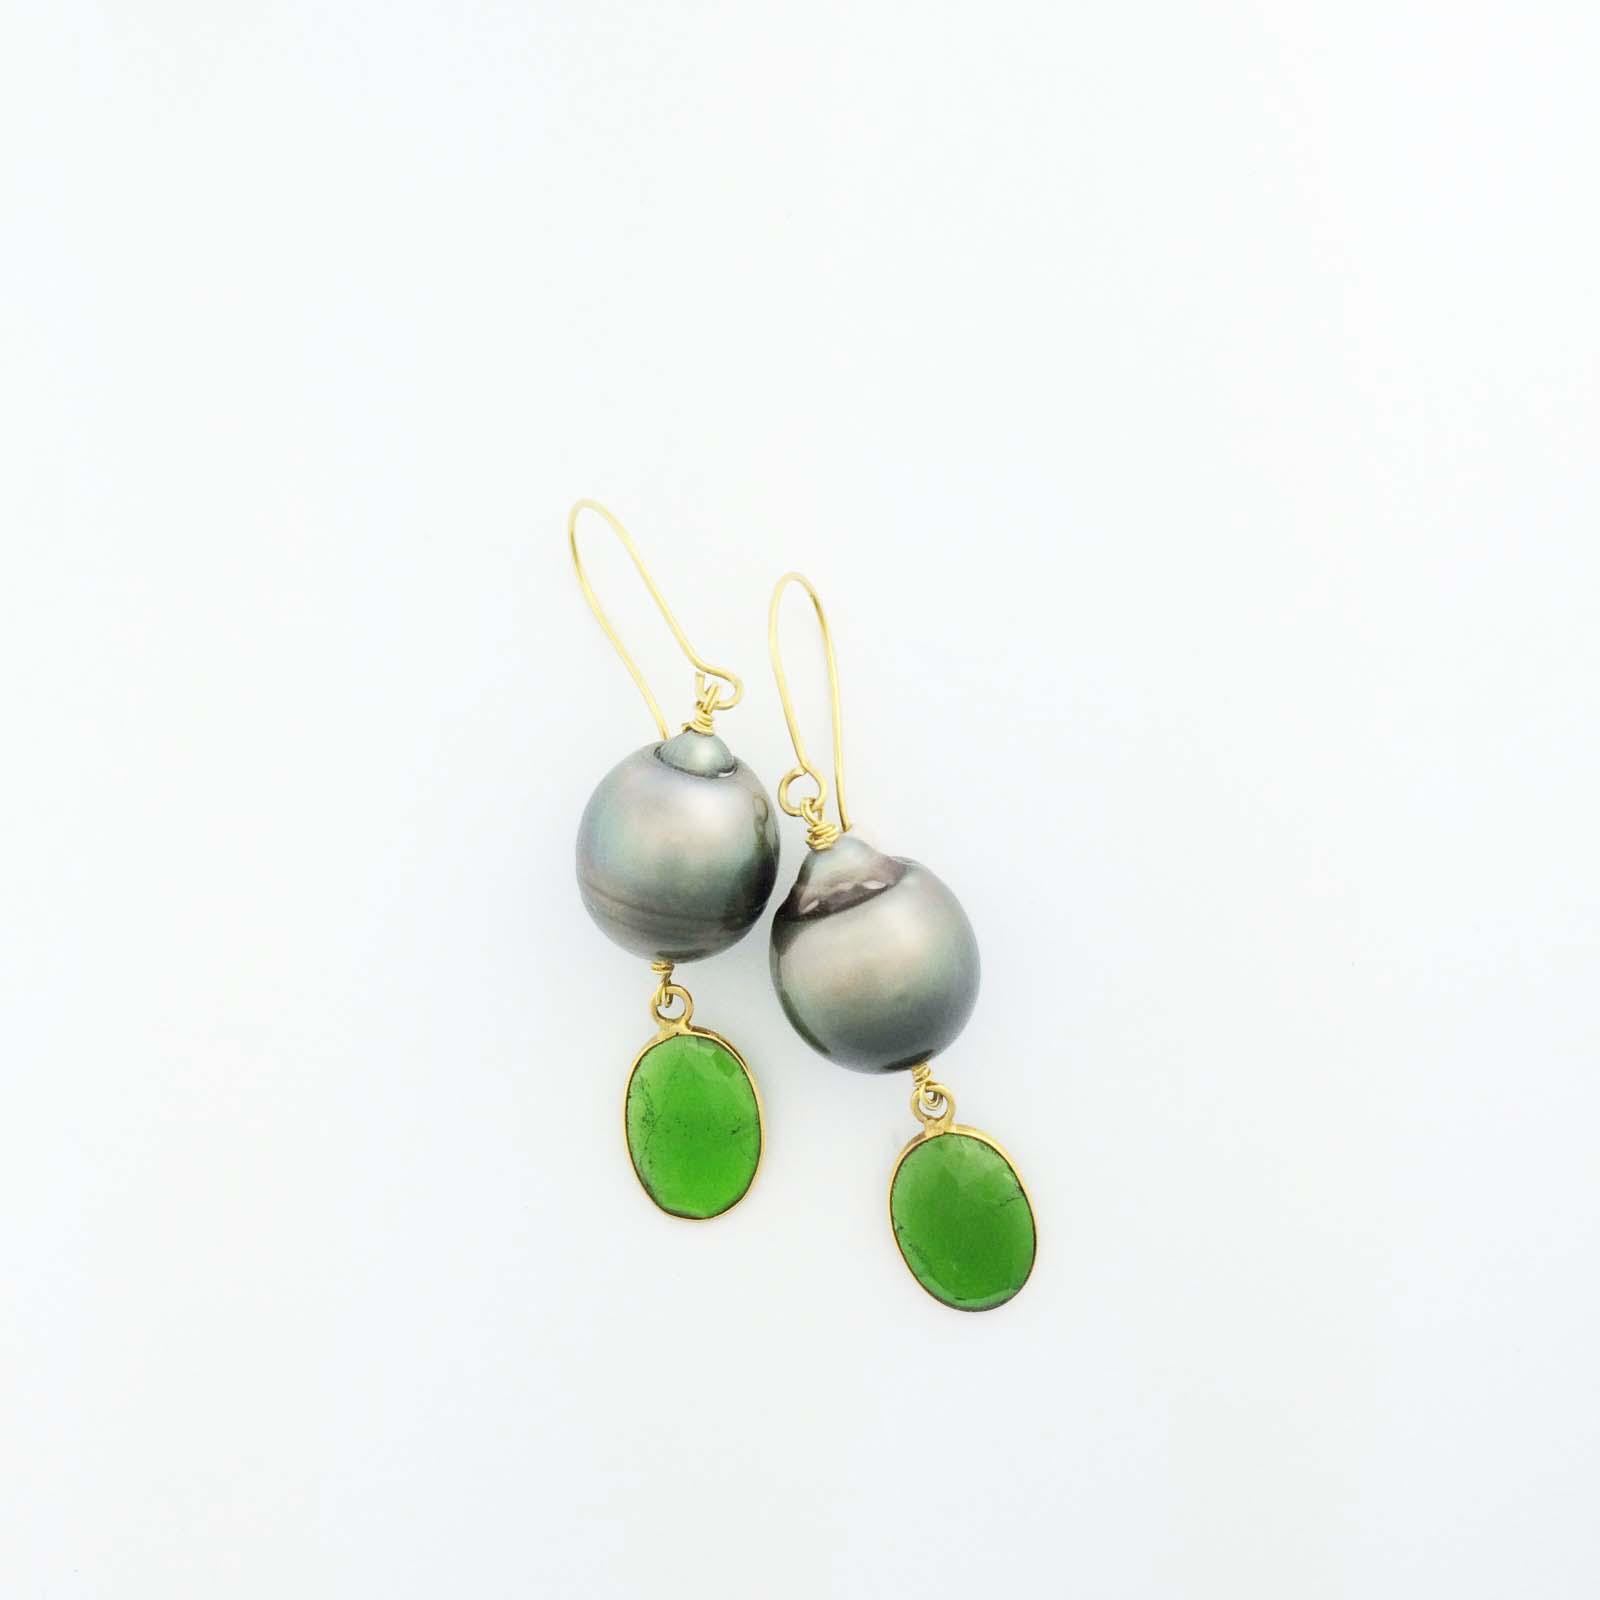 18k Tahitian pearl and green tourmaline earrings